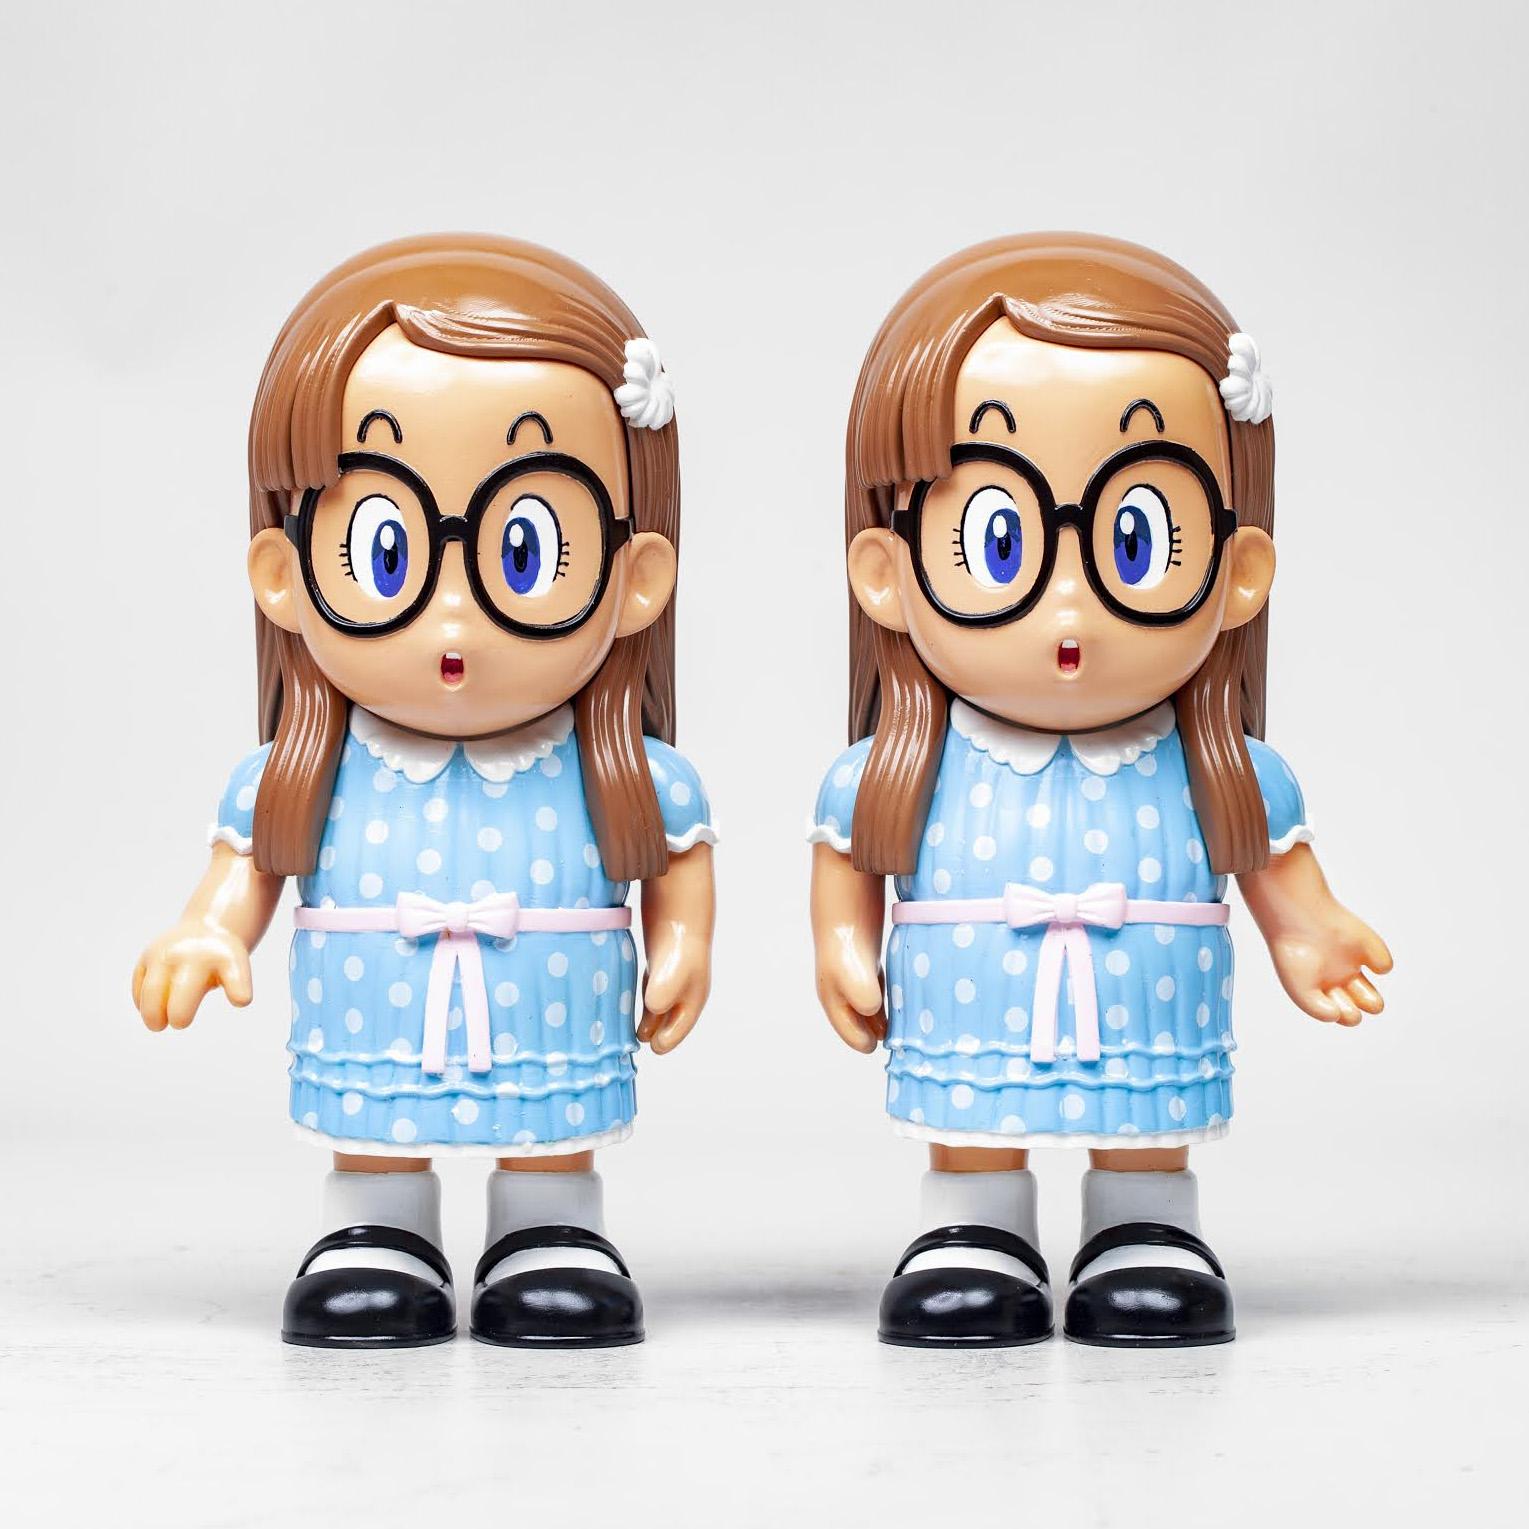 The Shocking Twins